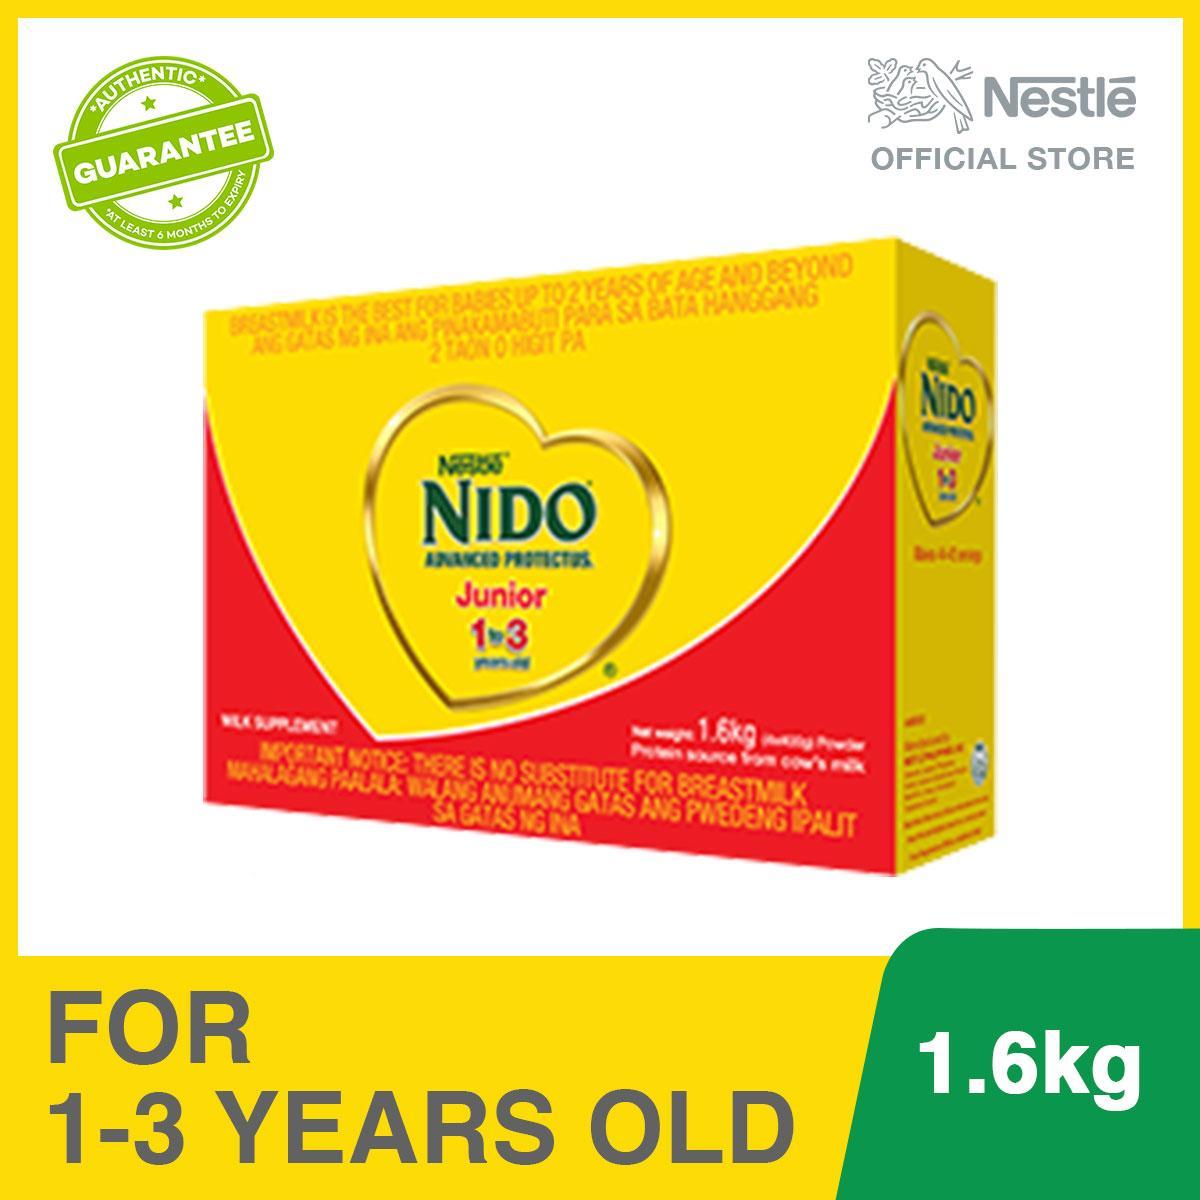 Nido Philippines: Nido price list - Protectus & Forti Choco Milk for